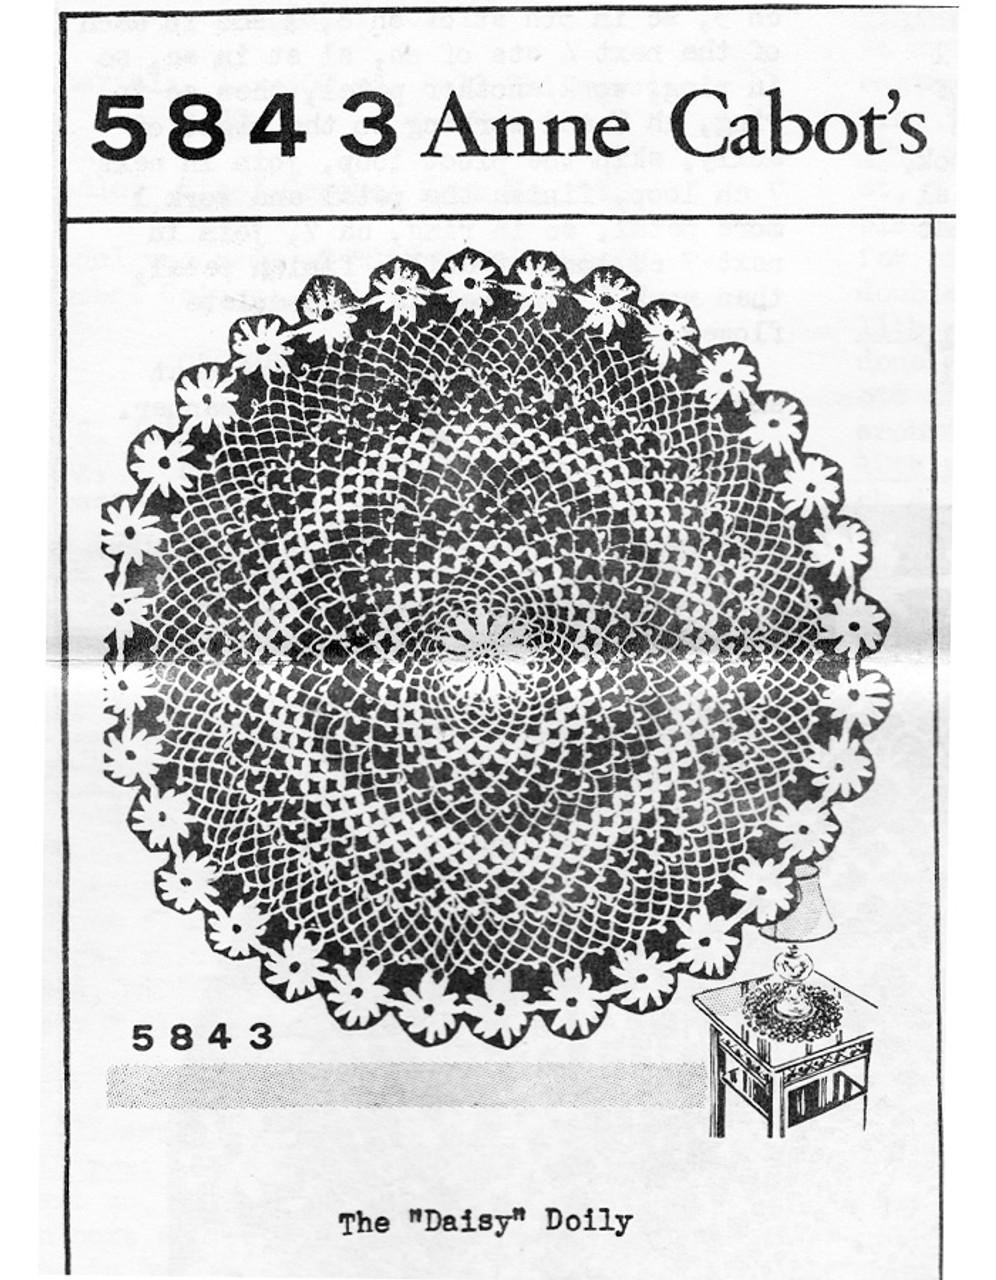 Vintage Doily Pattern, Daisy Border, Anne Cabot 5843